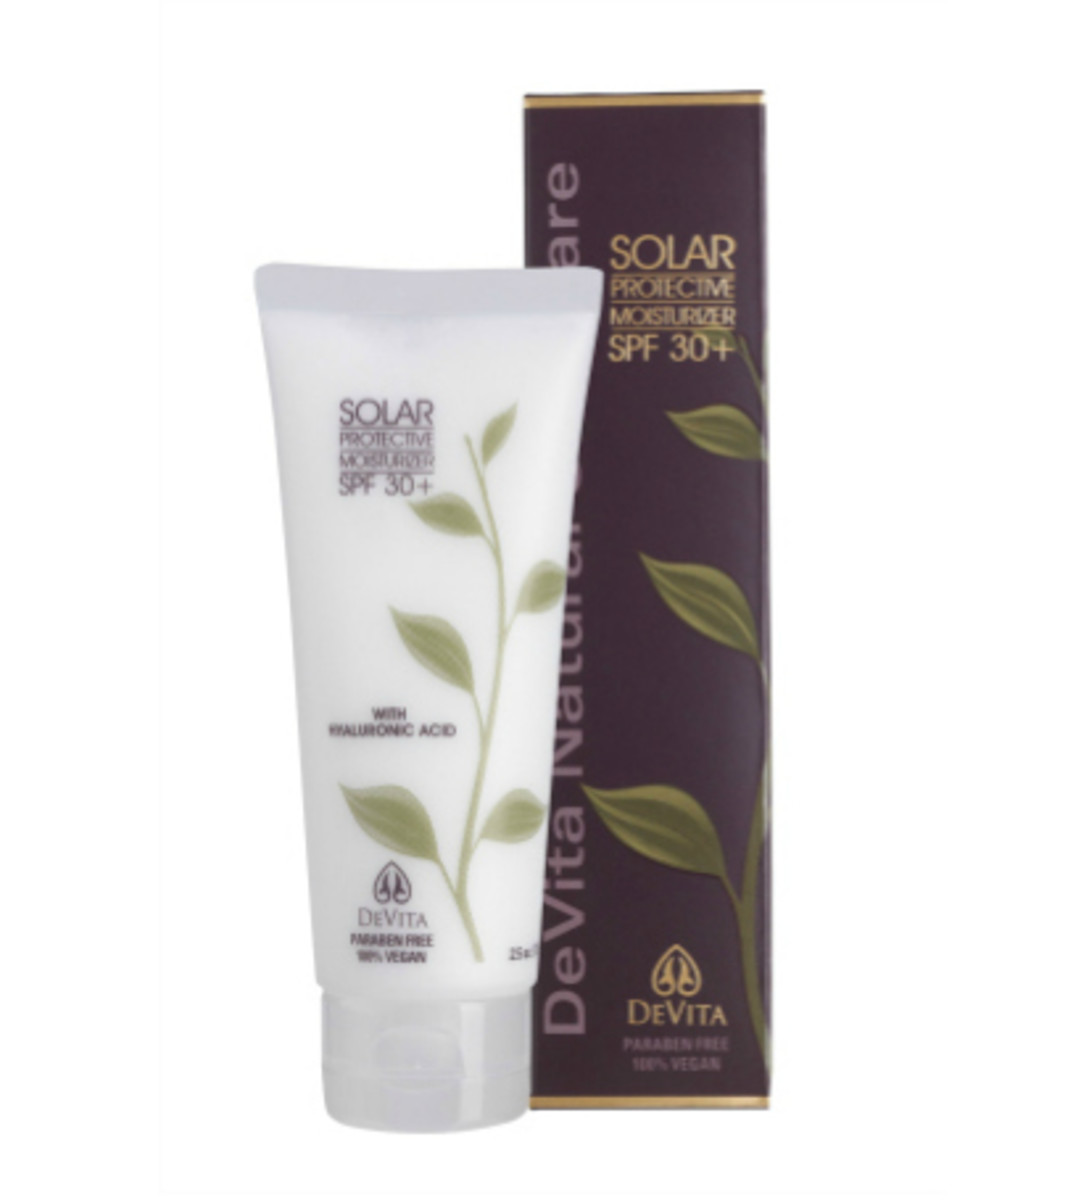 Natural Sunscreen DeVita Solar Moisturizer